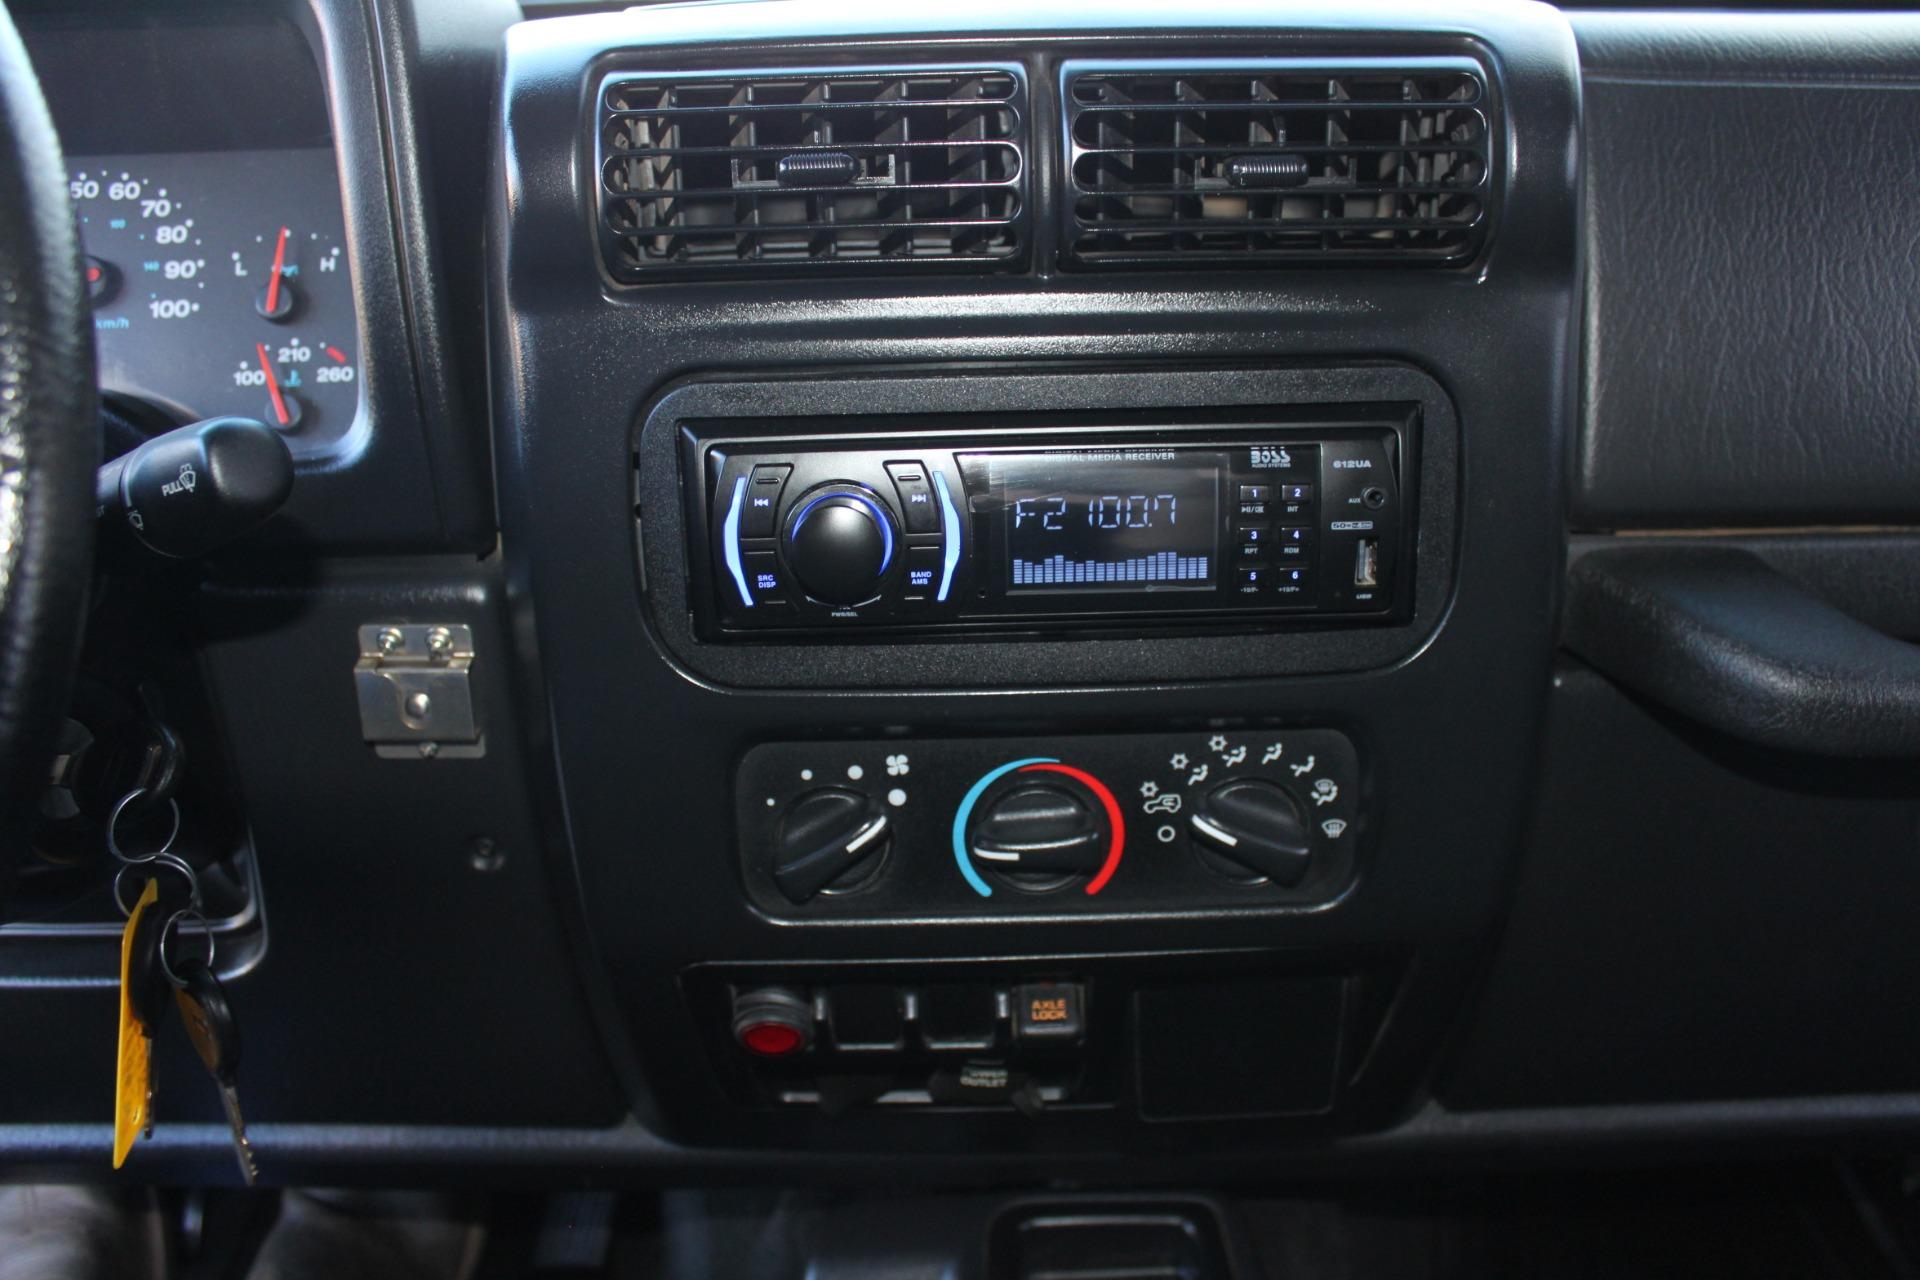 Used-2004-Jeep-Wrangler-Rubicon-Range-Rover